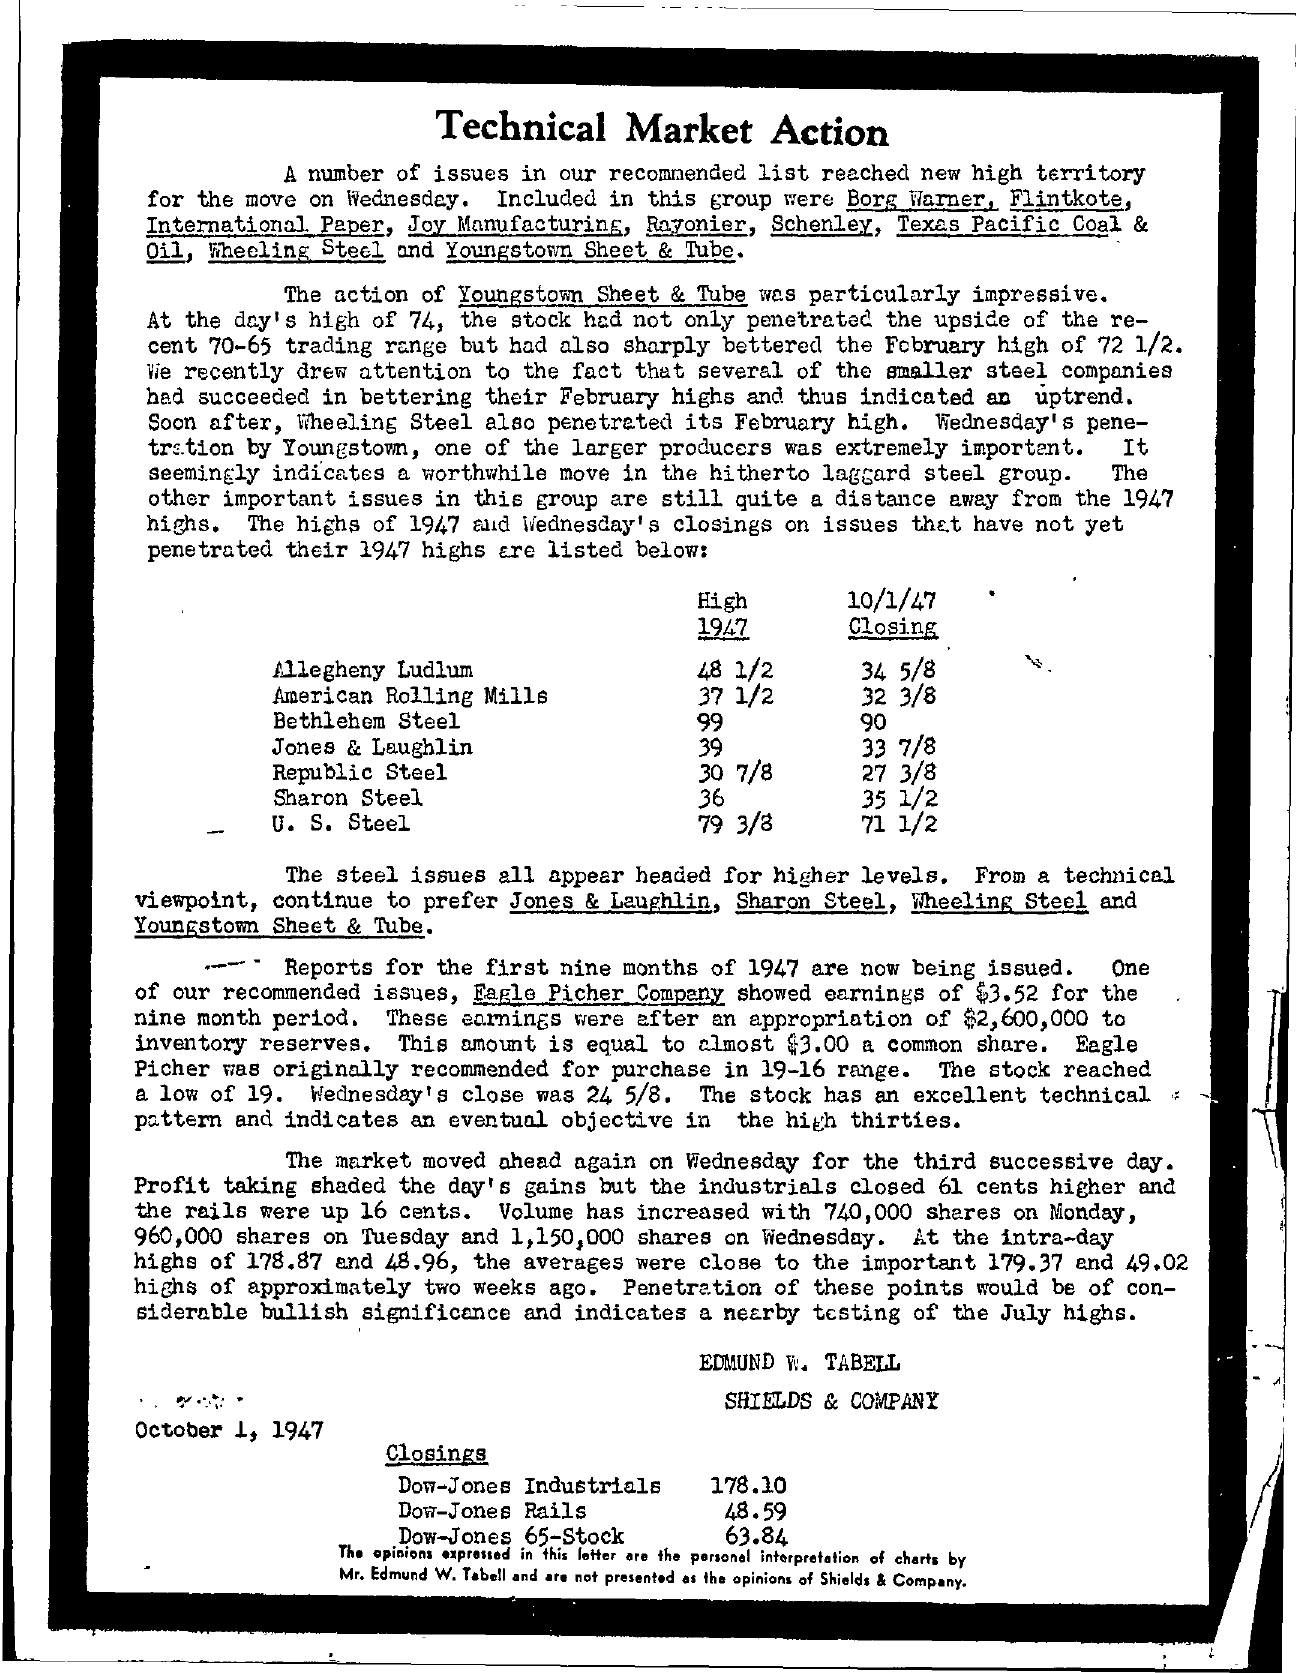 Tabell's Market Letter - October 01, 1947